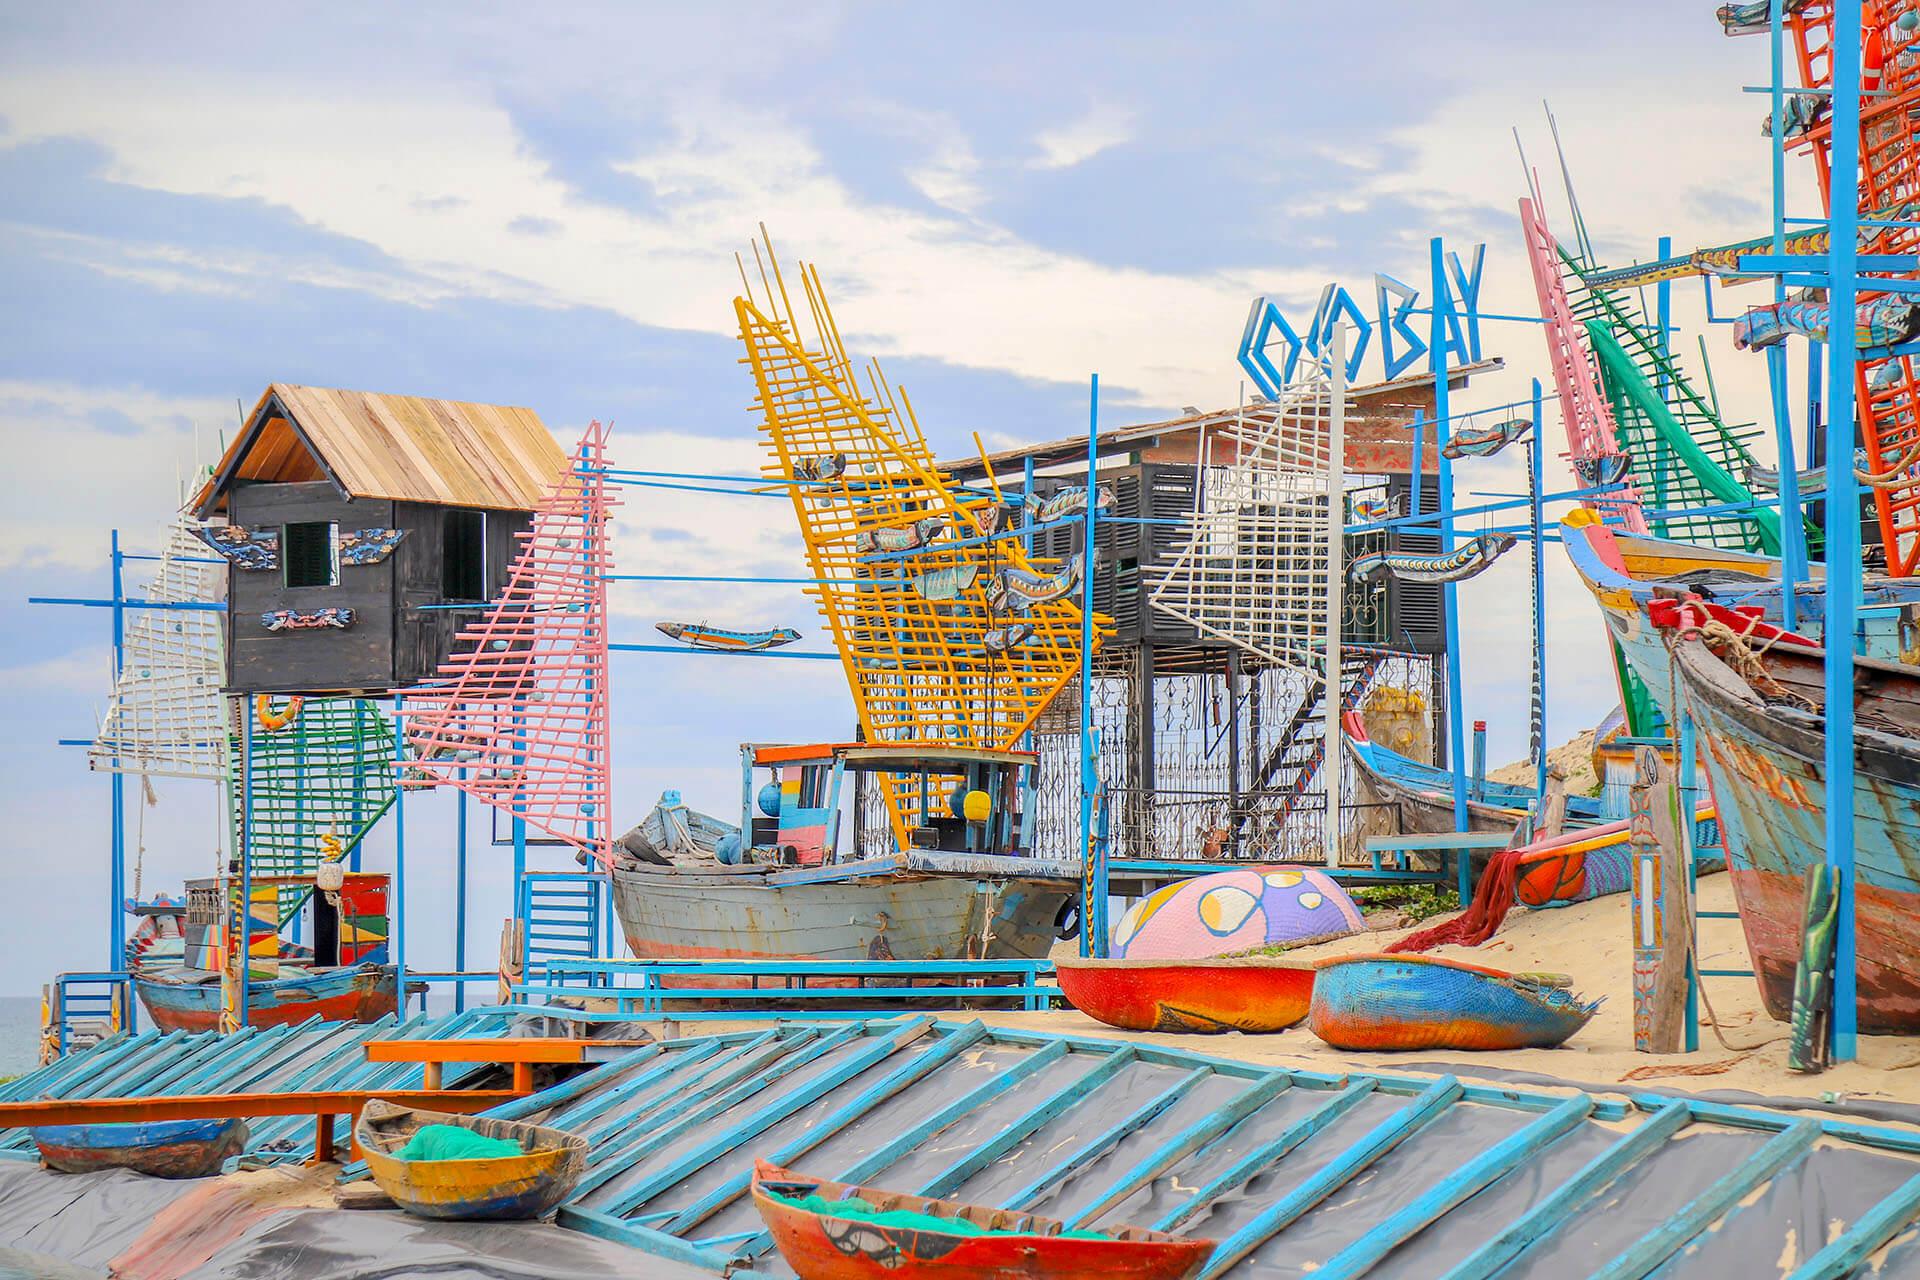 Summer Beach Bazaar Khu Tro Choi Nuoc Pho Am Thuc Nghe Thuat Ven Bien Moi Toanh Tai Da Nang Khu Bam Bien Nha Ngoc